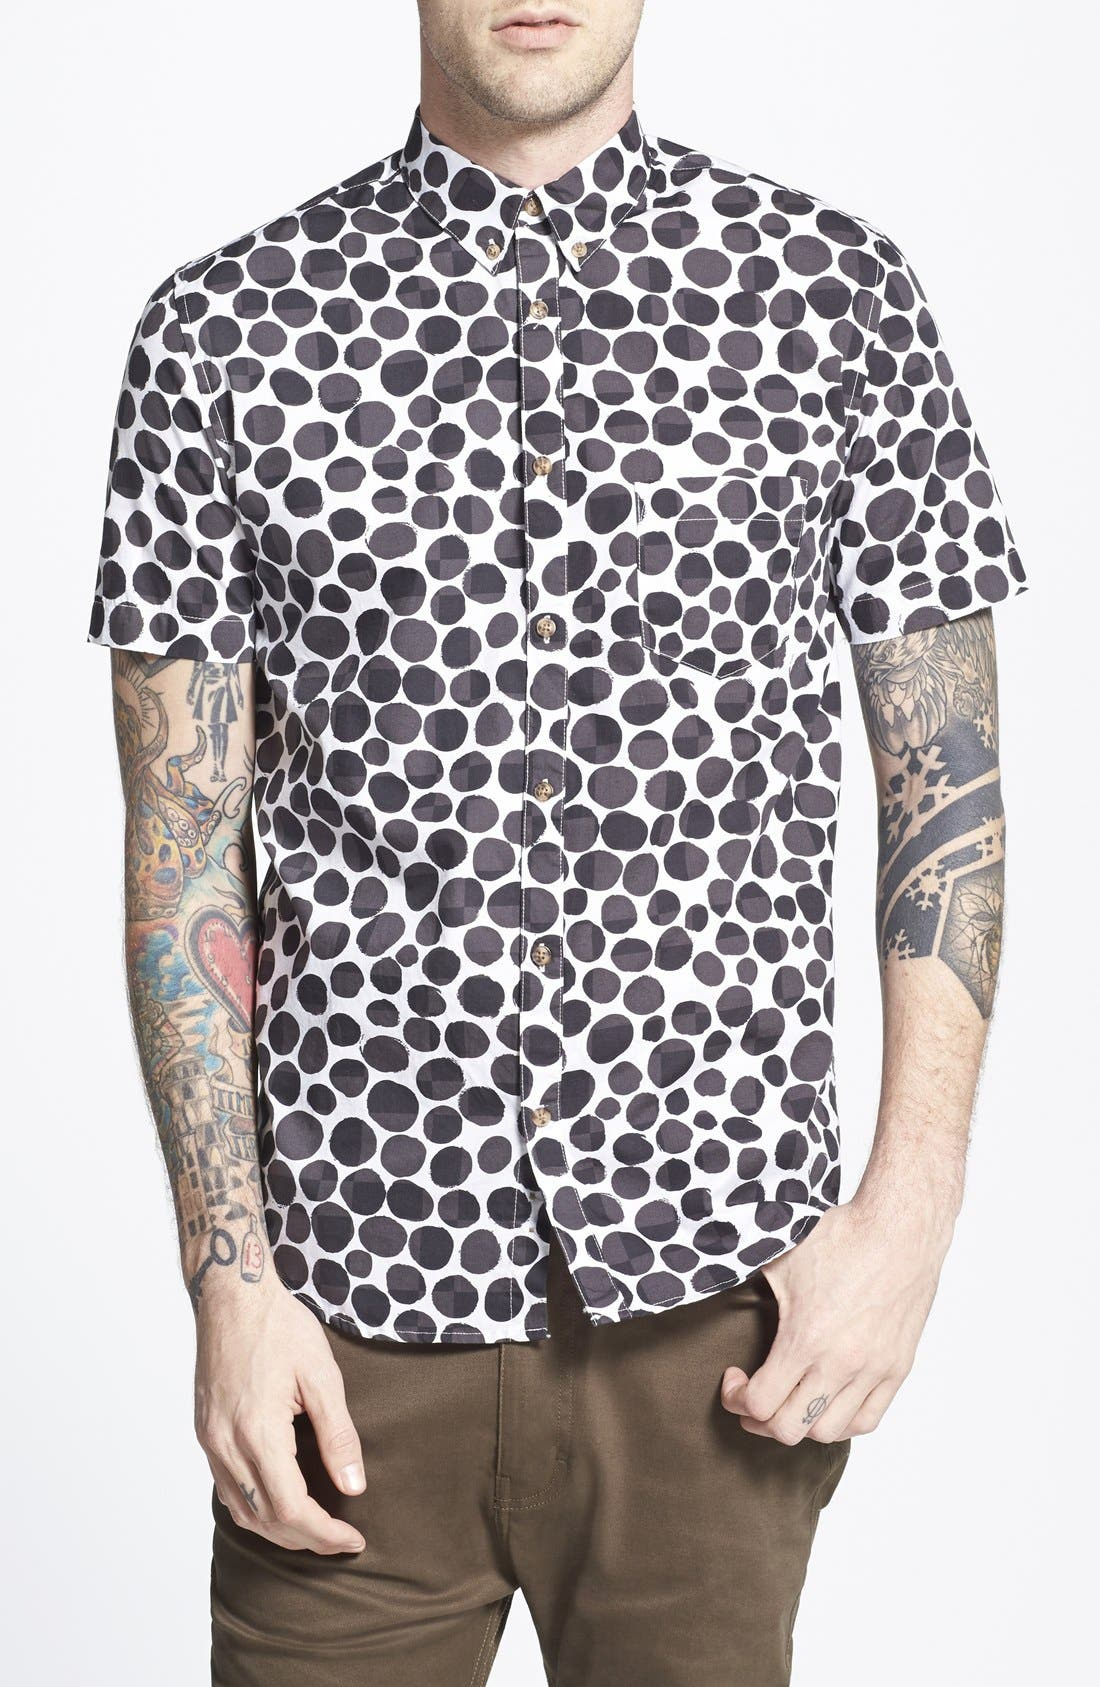 BARNEY COOLS Trim Fit Short Sleeve Pebble Print Oxford Shirt, Main, color, 001